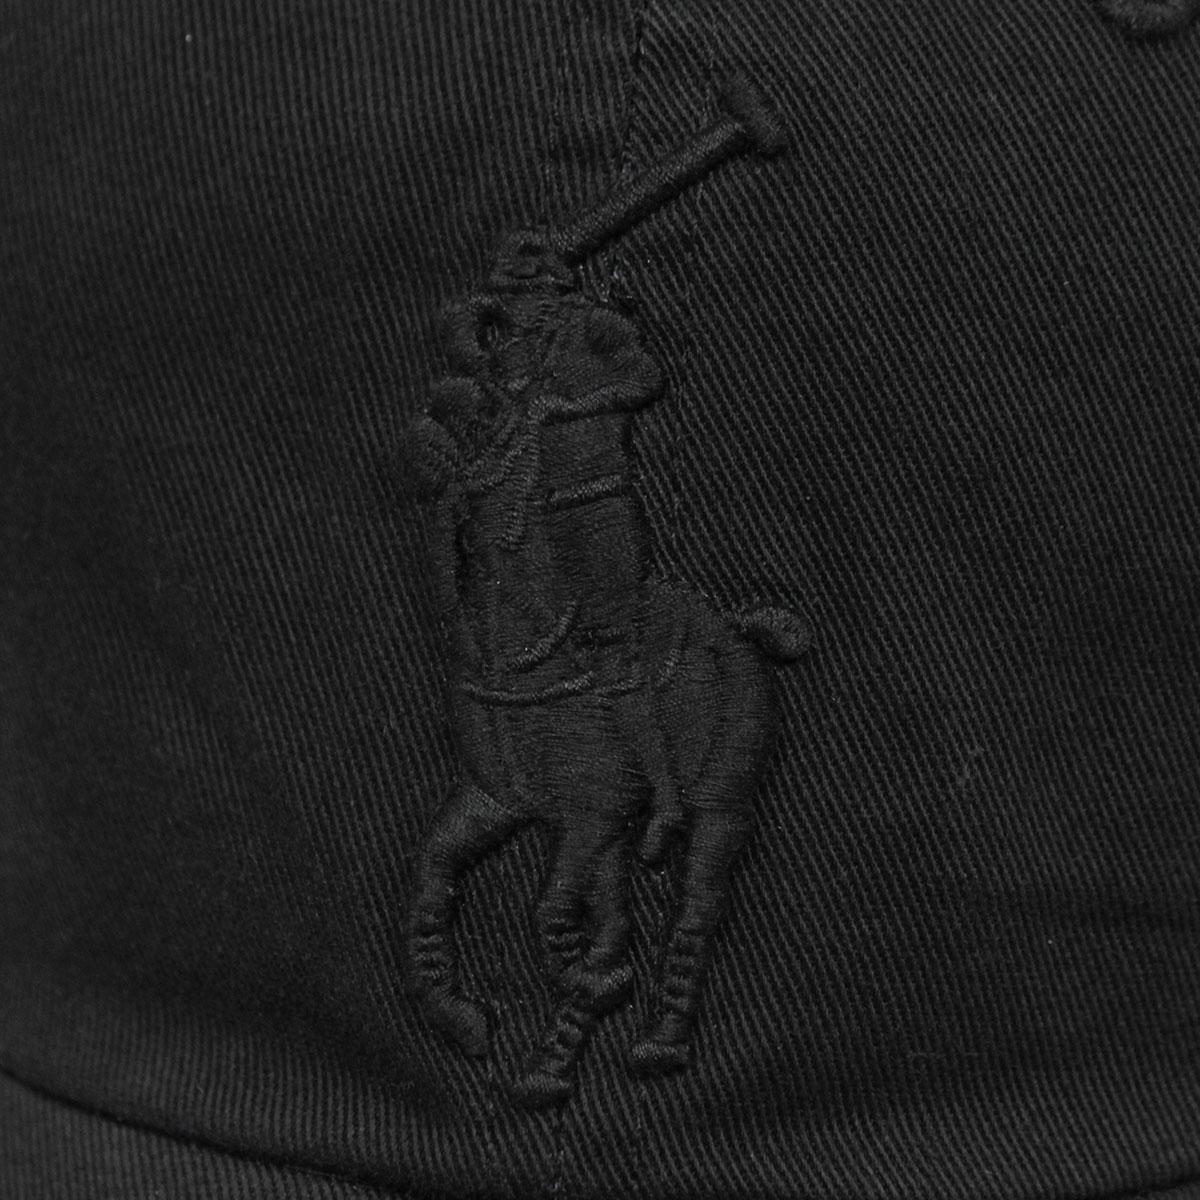 Polo Ralph Lauren POLO RALPH LAUREN regular article men cap big pony hat  BIG PONY COTTON CHINO BASEBALL CAP ff40e79de493